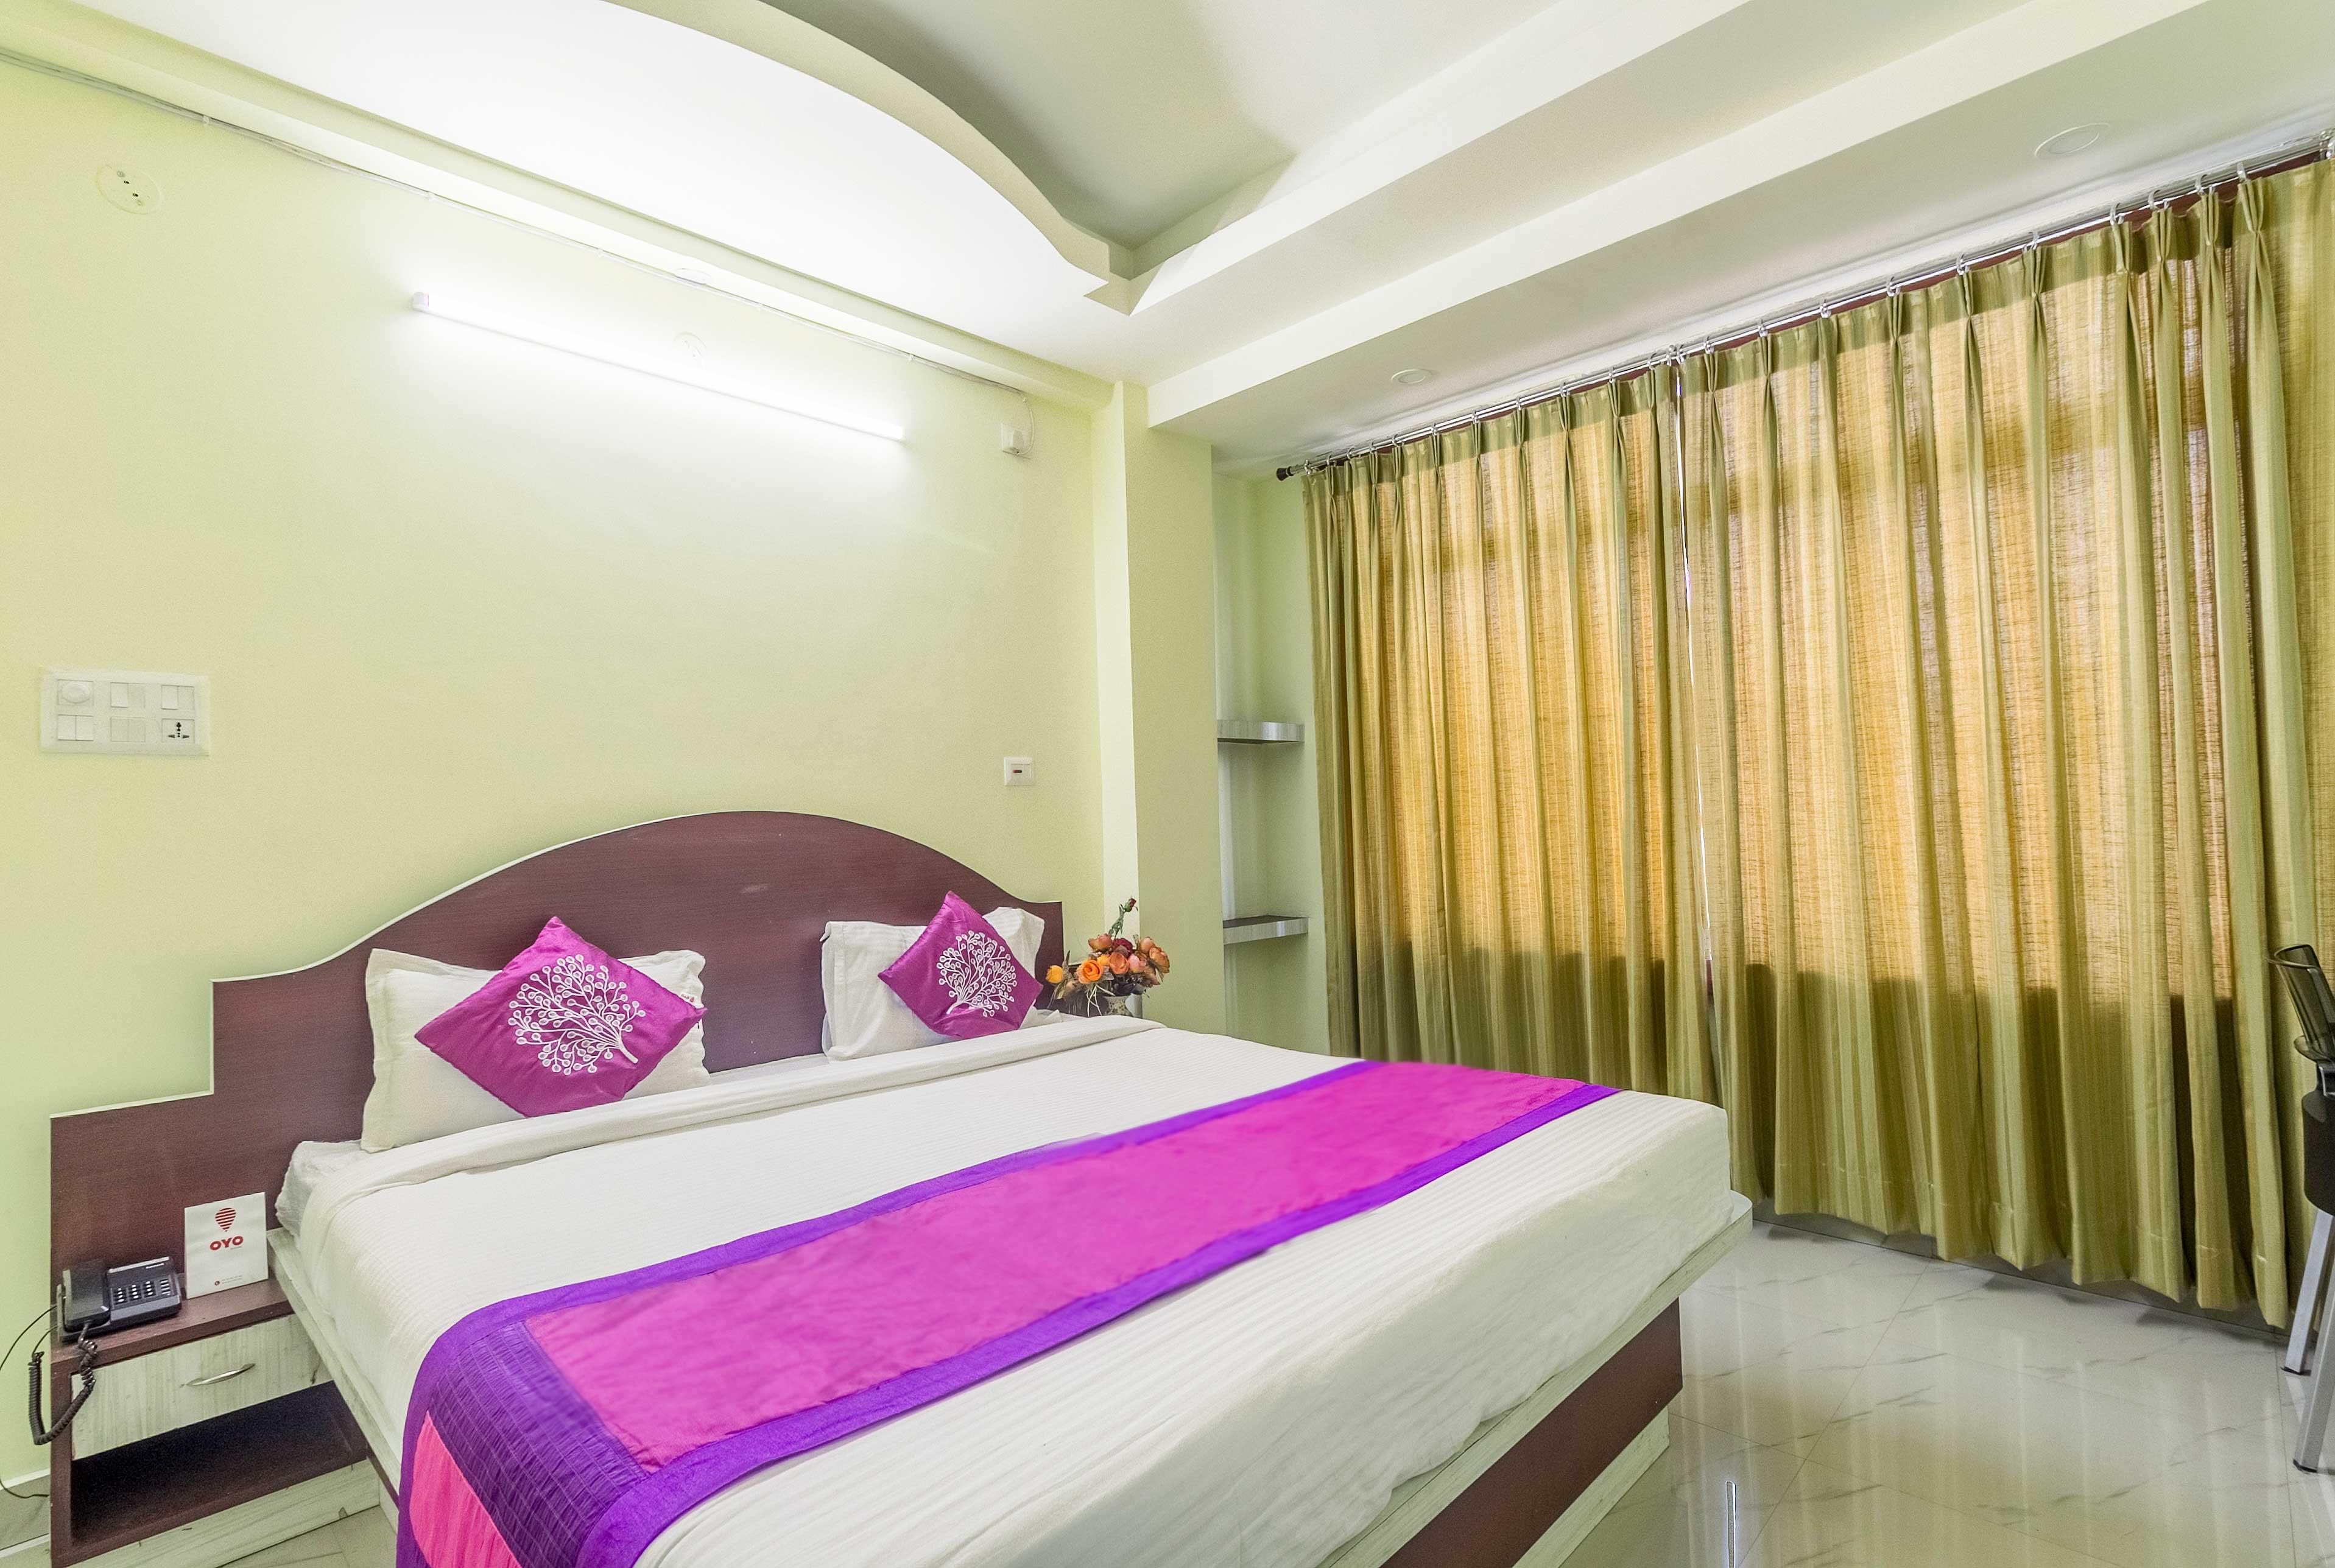 OYO 4862 Bikas Inn in Chandrapur Bagicha